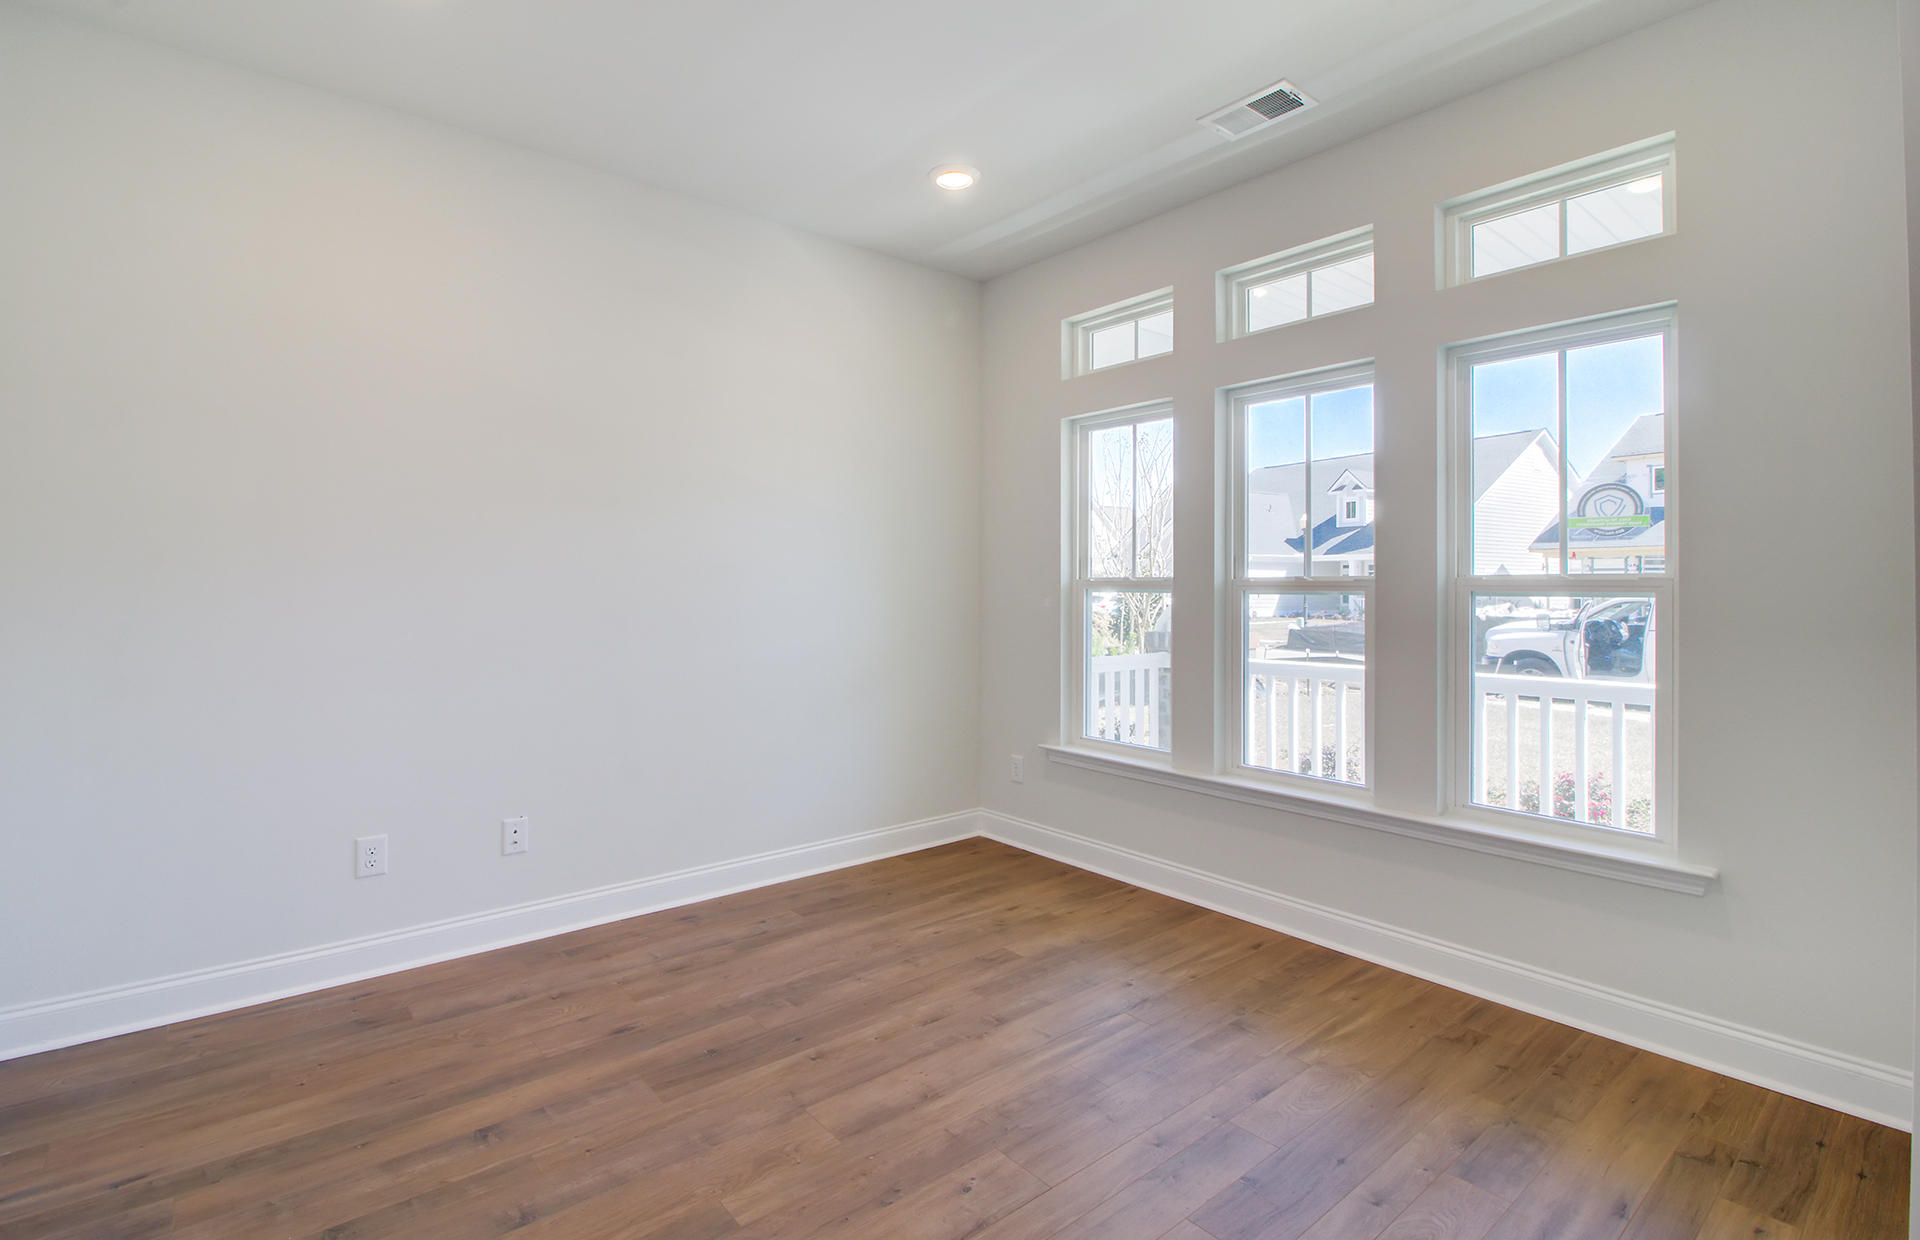 Park West Homes For Sale - 3066 Rice Field, Mount Pleasant, SC - 2